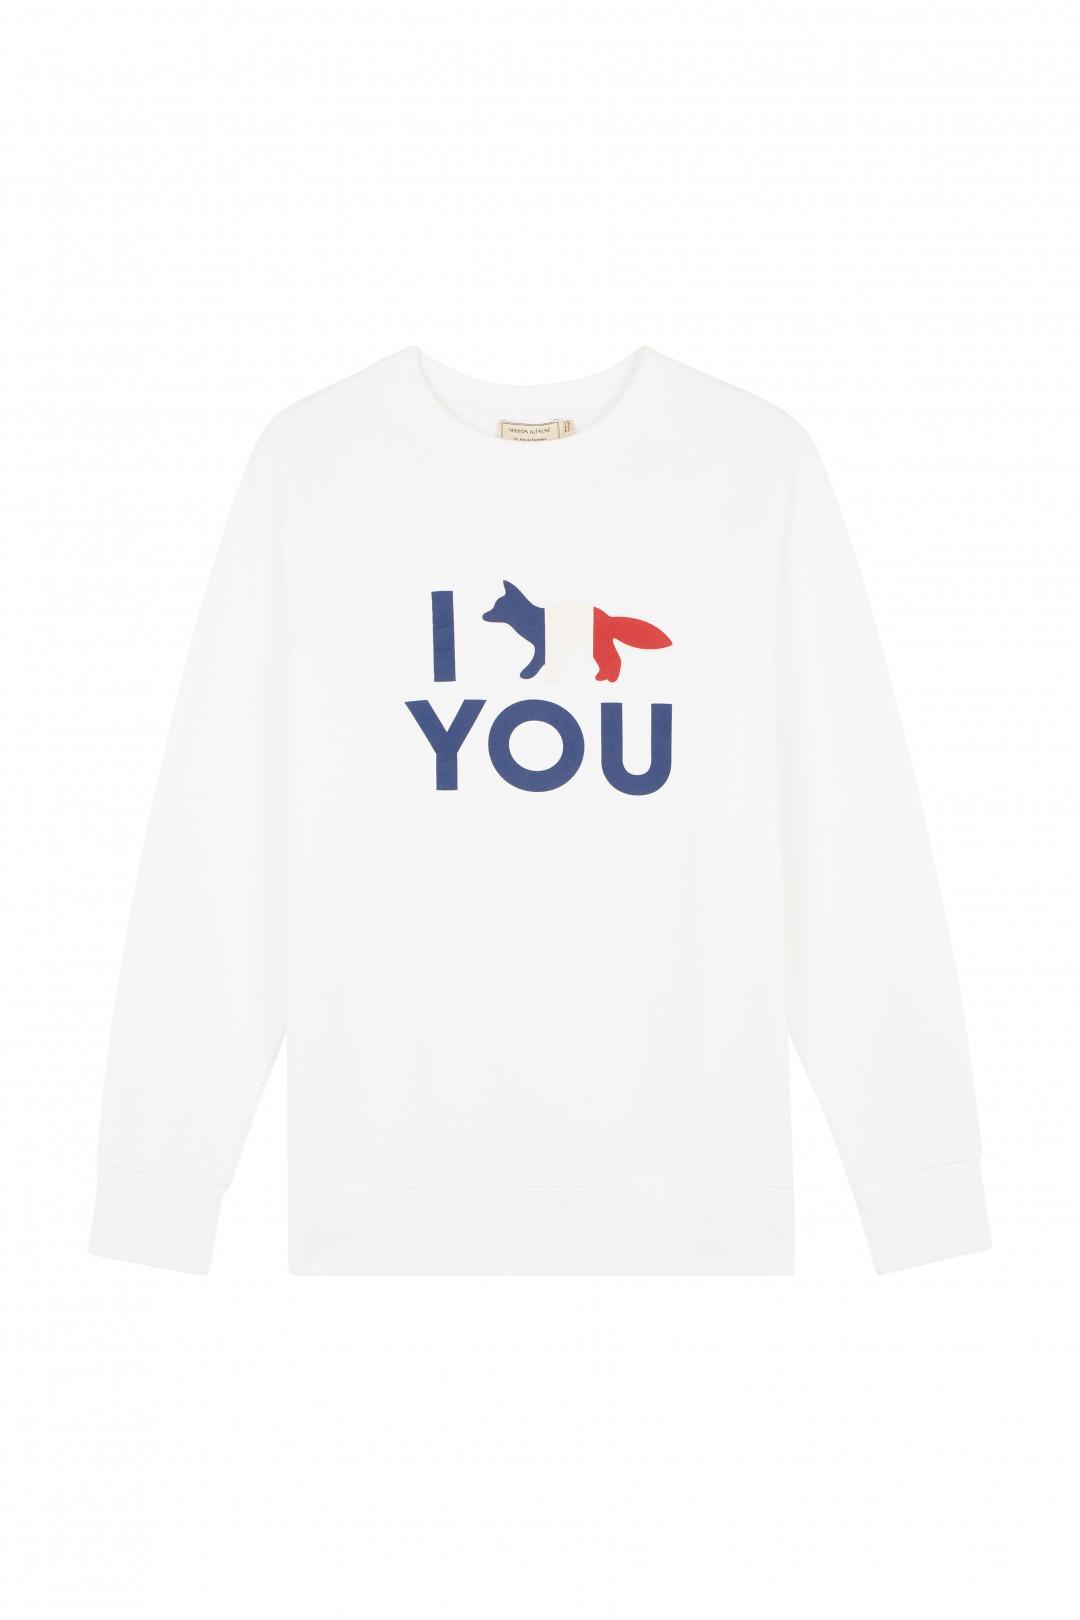 MAISON KITSUNÉが、トリコロールフォックスのキャンペーン「I FOX YOU: YOUR NEW FAVORITE ANIMAL」を開催